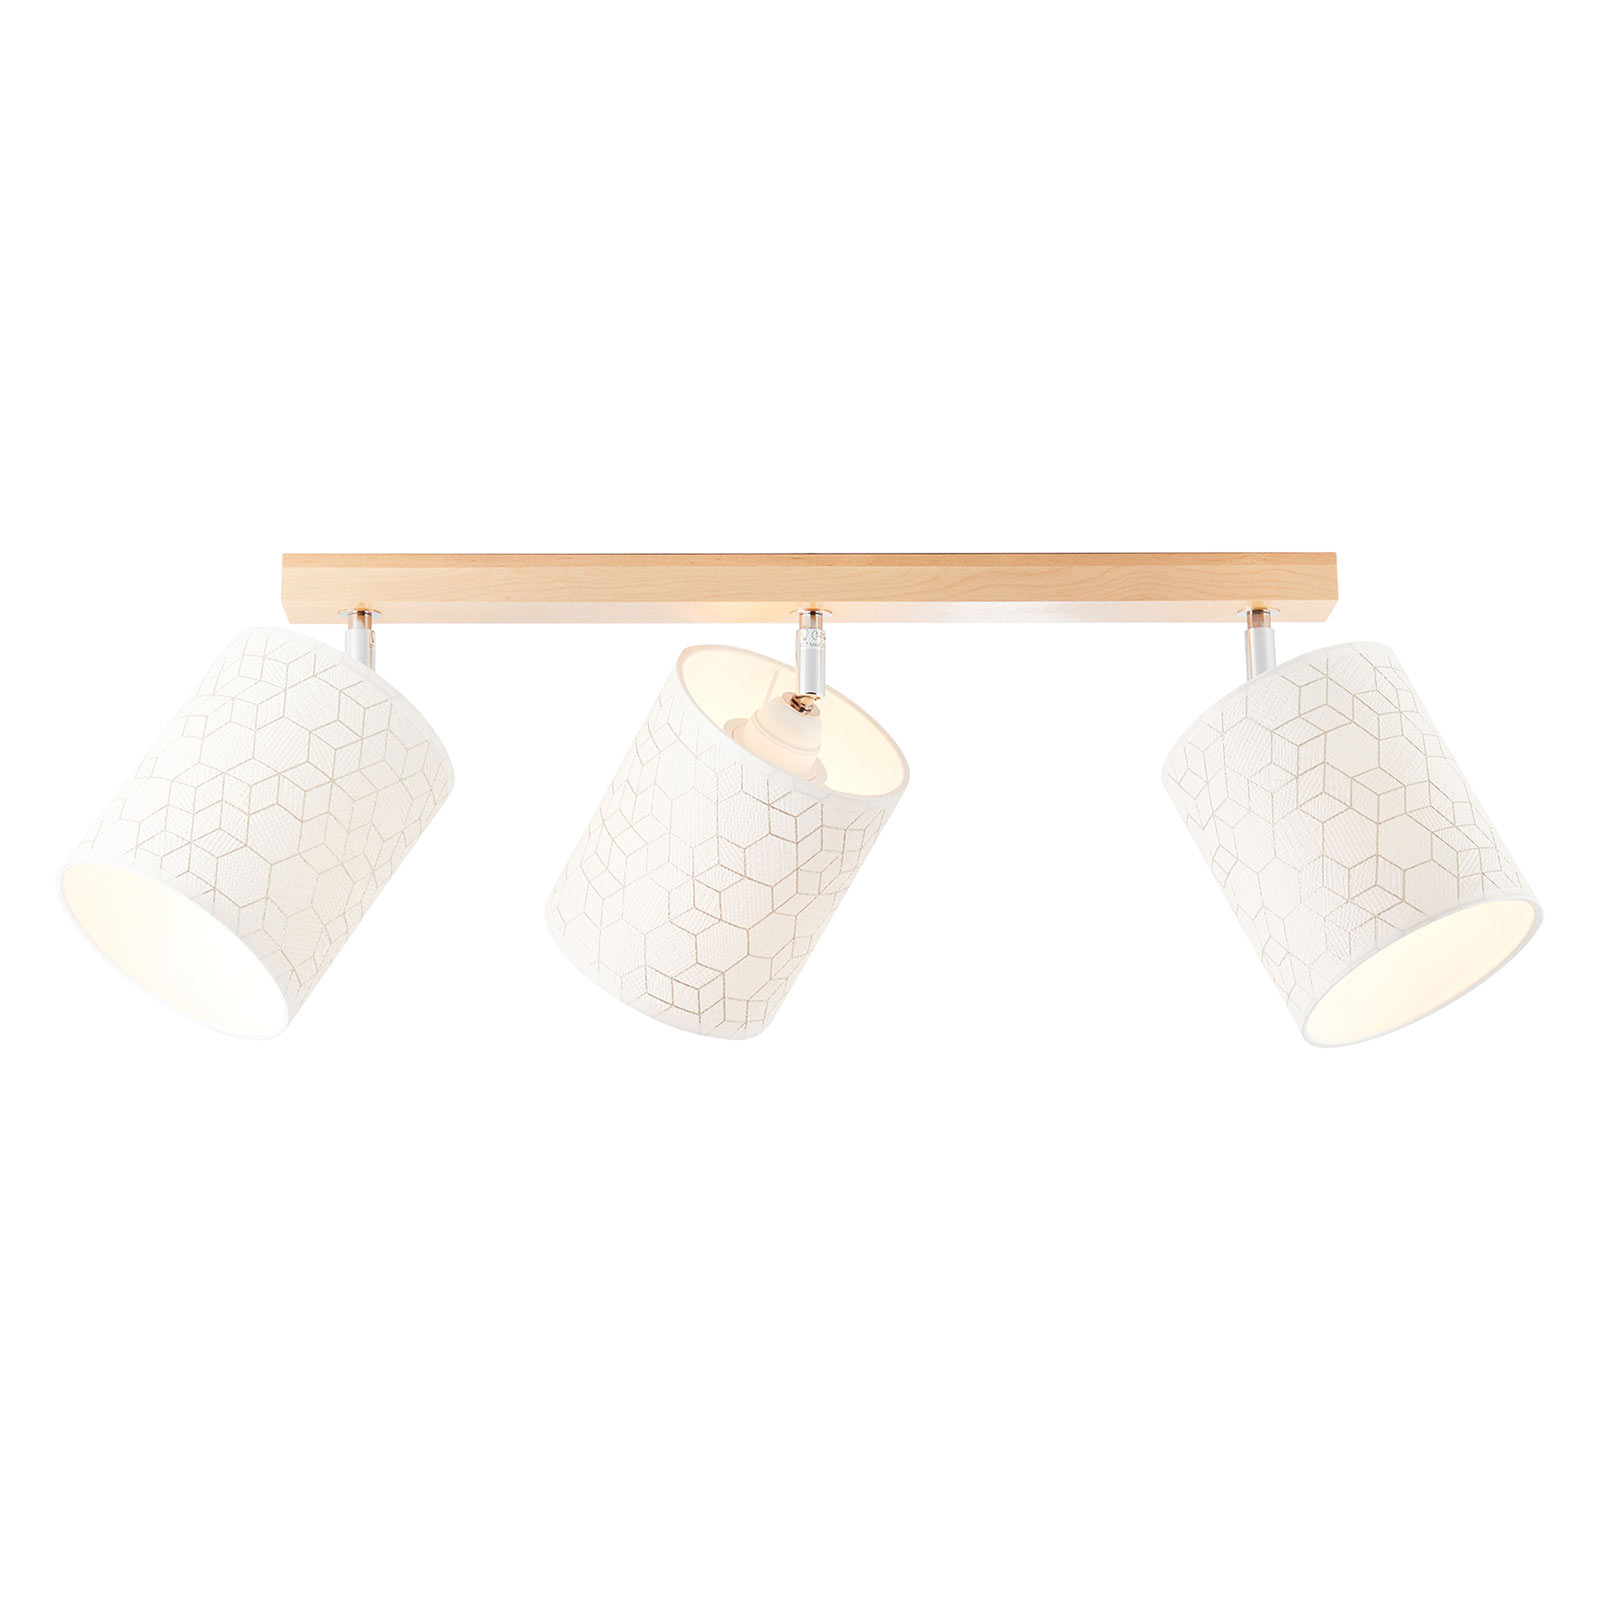 Taklampe Galance, hvit, 3 lyskilder